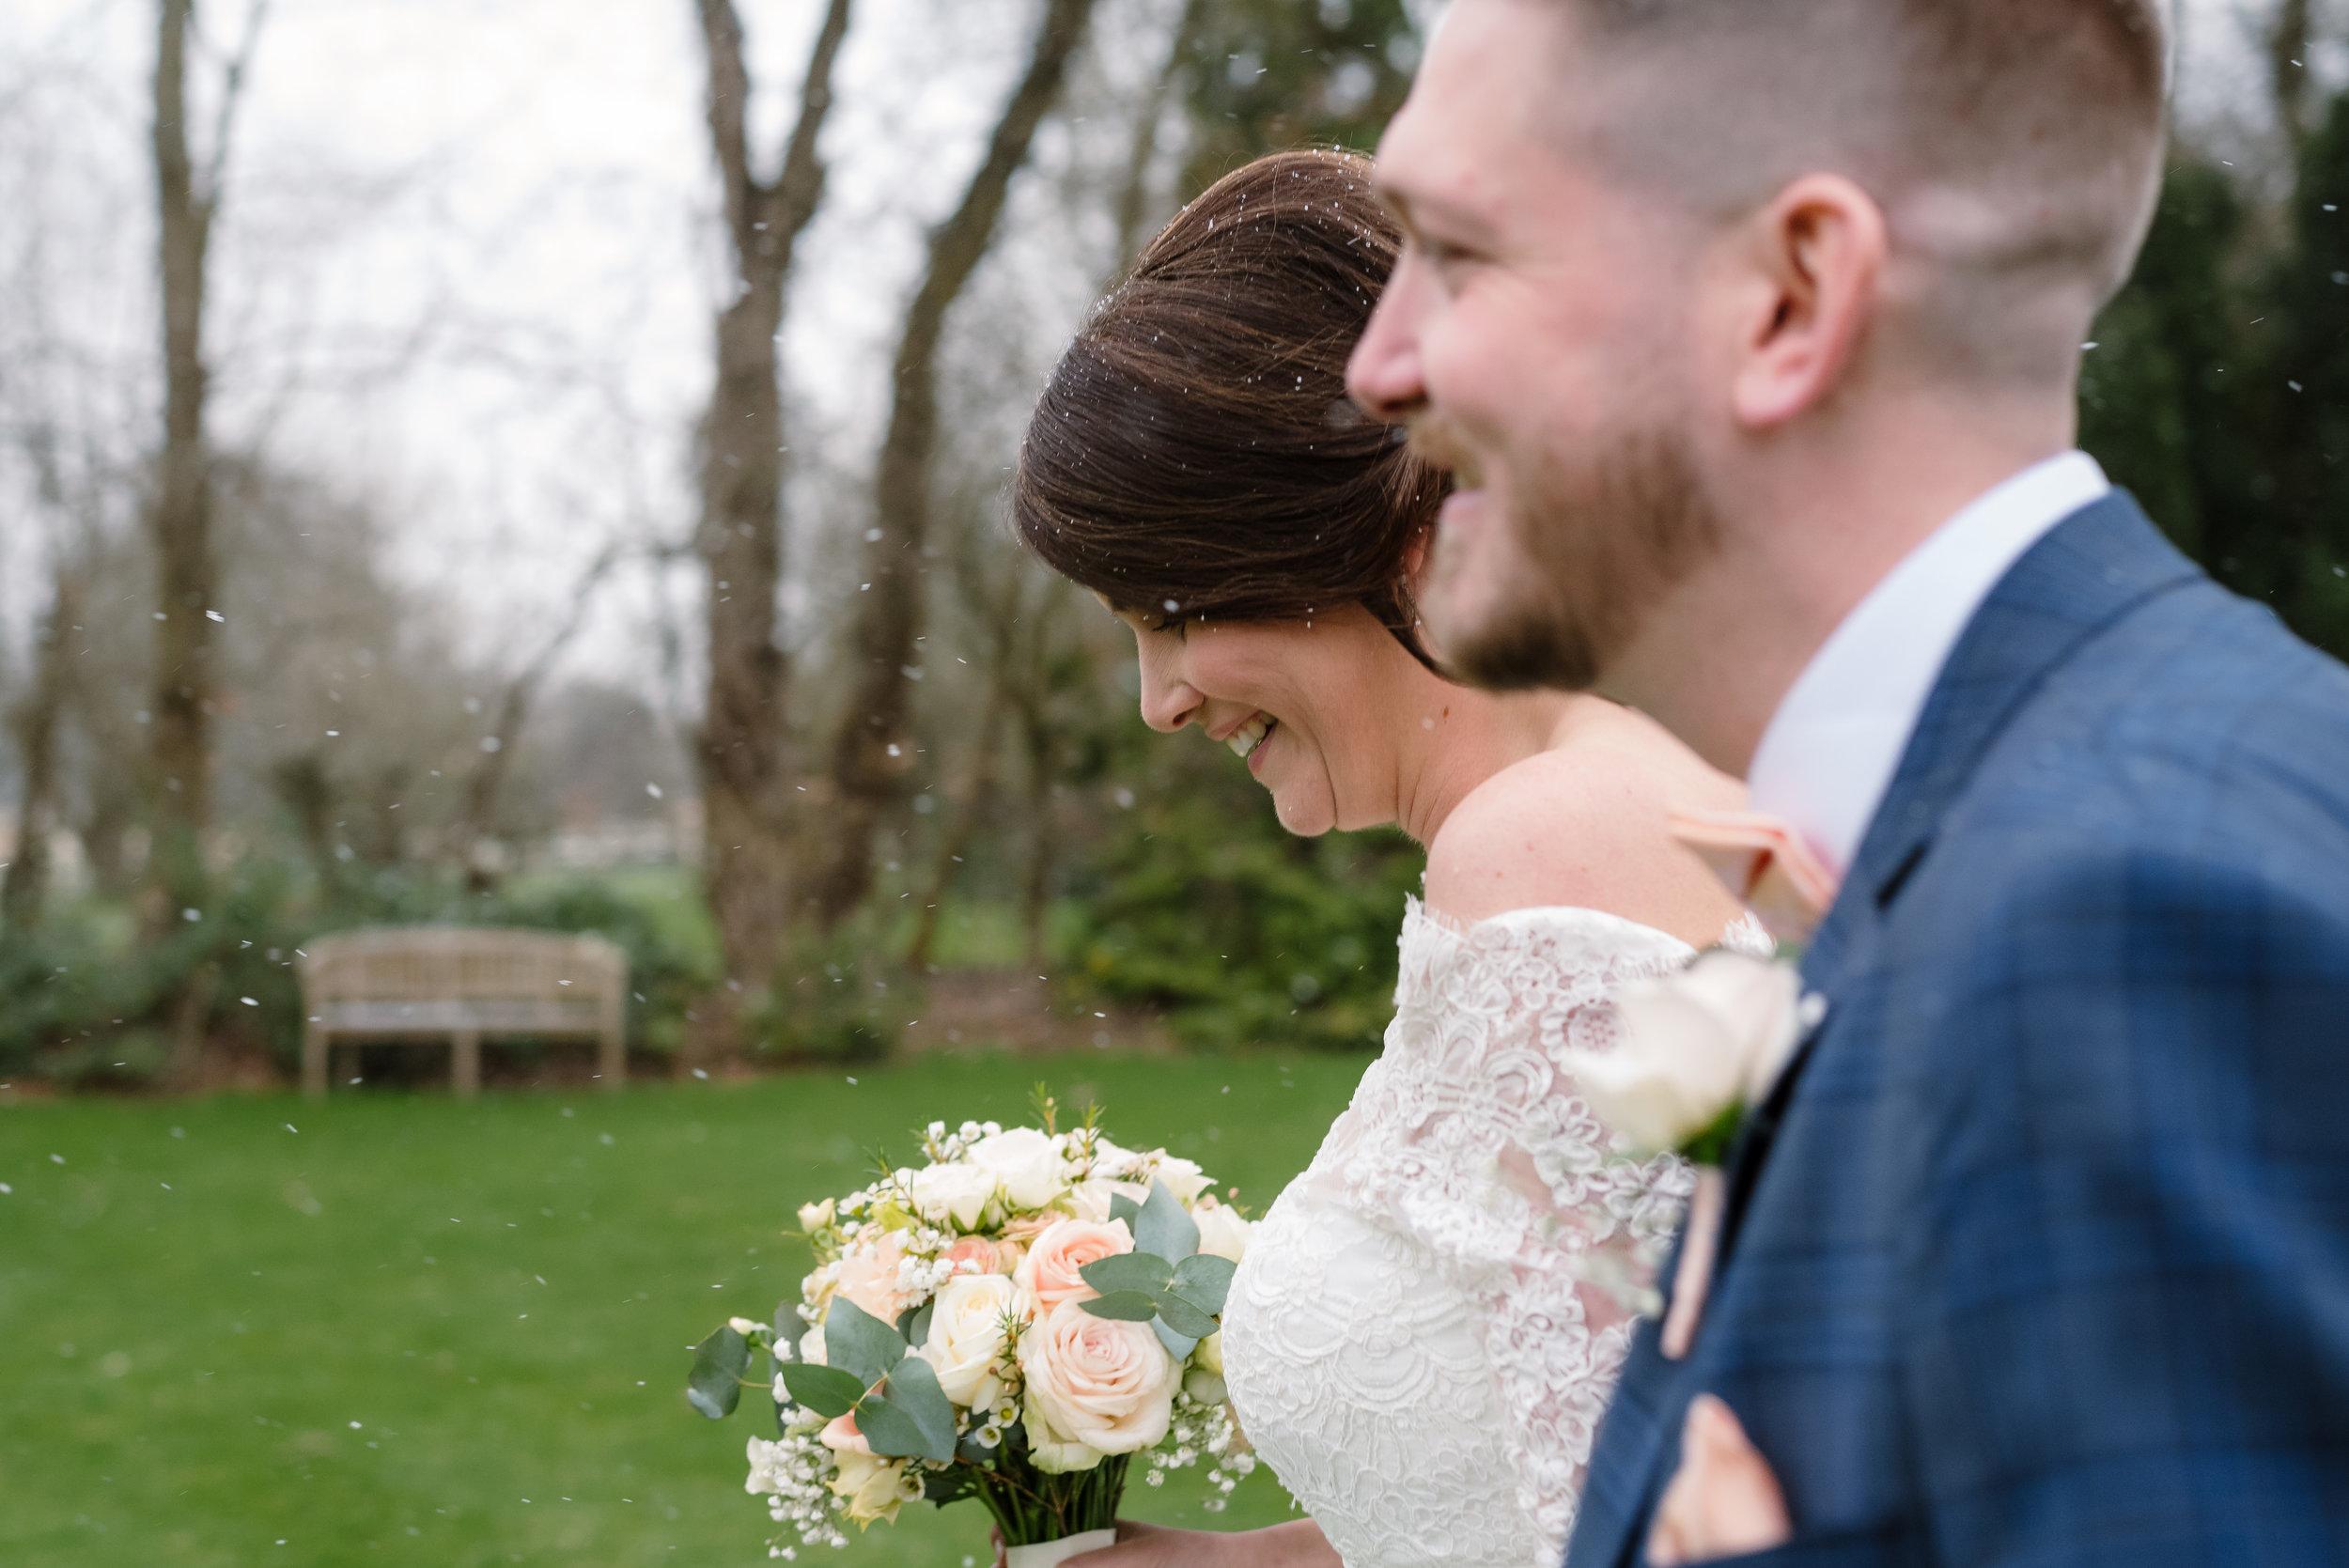 Sarah-Fishlock-Photography-Hampshire-wedding-photographer-hampshire : fleet-wedding-photographer-fleet : rivervale-barn-wedding-photographer : hampshire-barn-wedding-venue : hampshire-wedding-venue : barn-wedding-hampshire : rivervale-barn-774.jpg